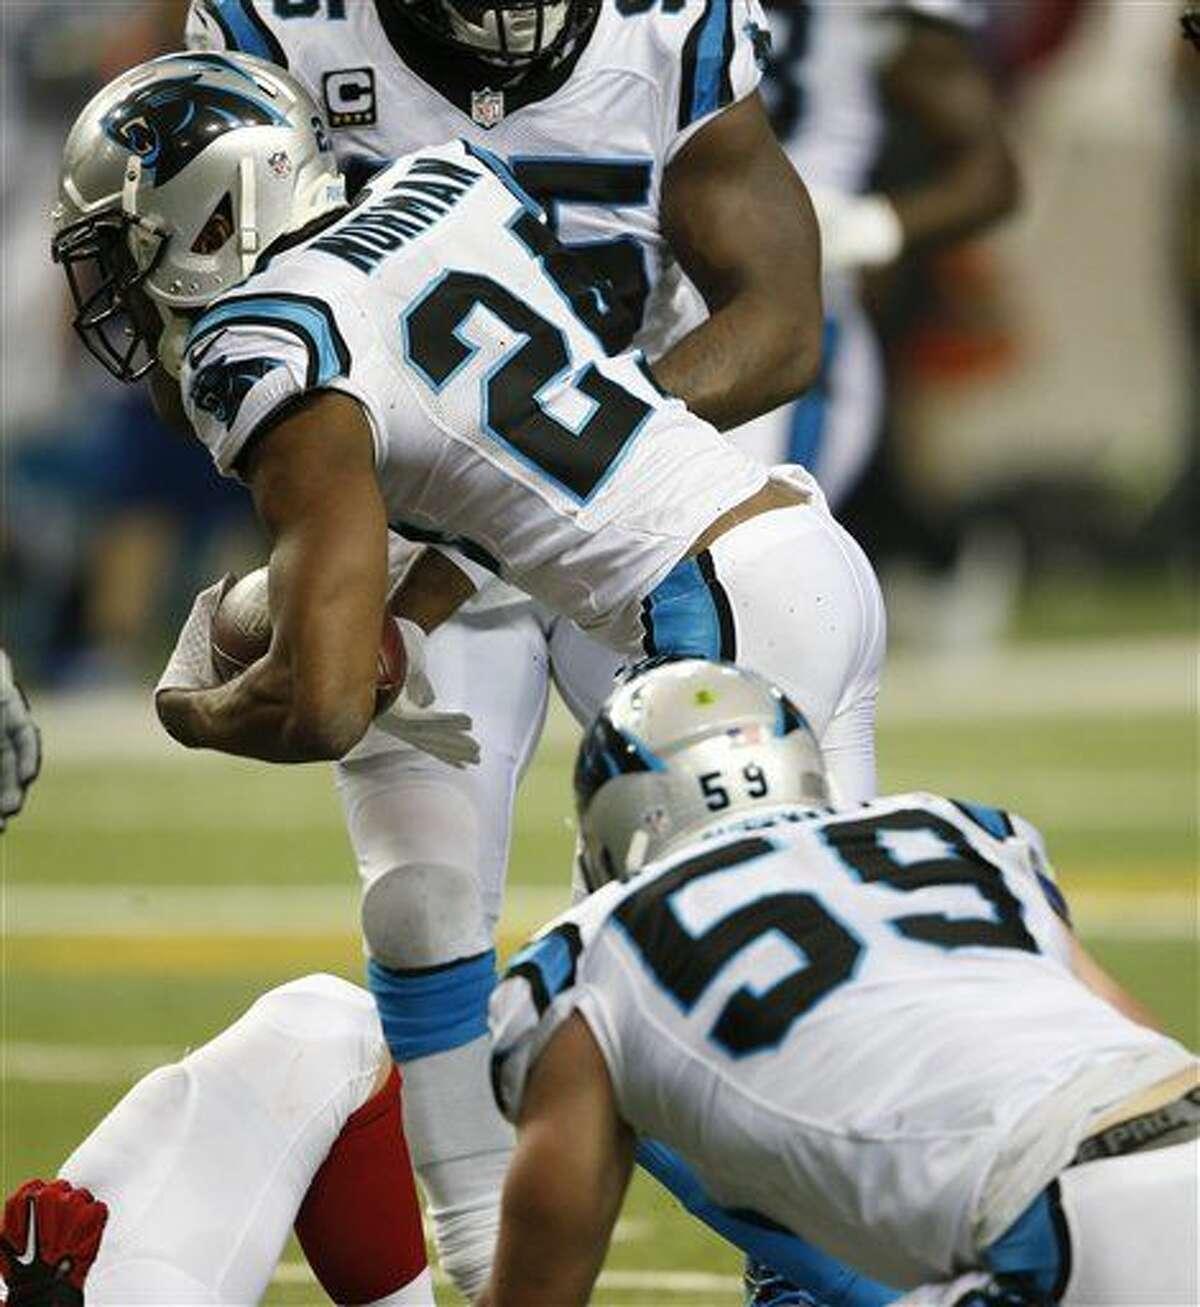 Carolina Panthers cornerback Josh Norman (24) recovers a loose ball against the Atlanta Falcons during the second half of an NFL football game, Sunday, Dec. 27, 2015, in Atlanta. (AP Photo/John Bazemore)